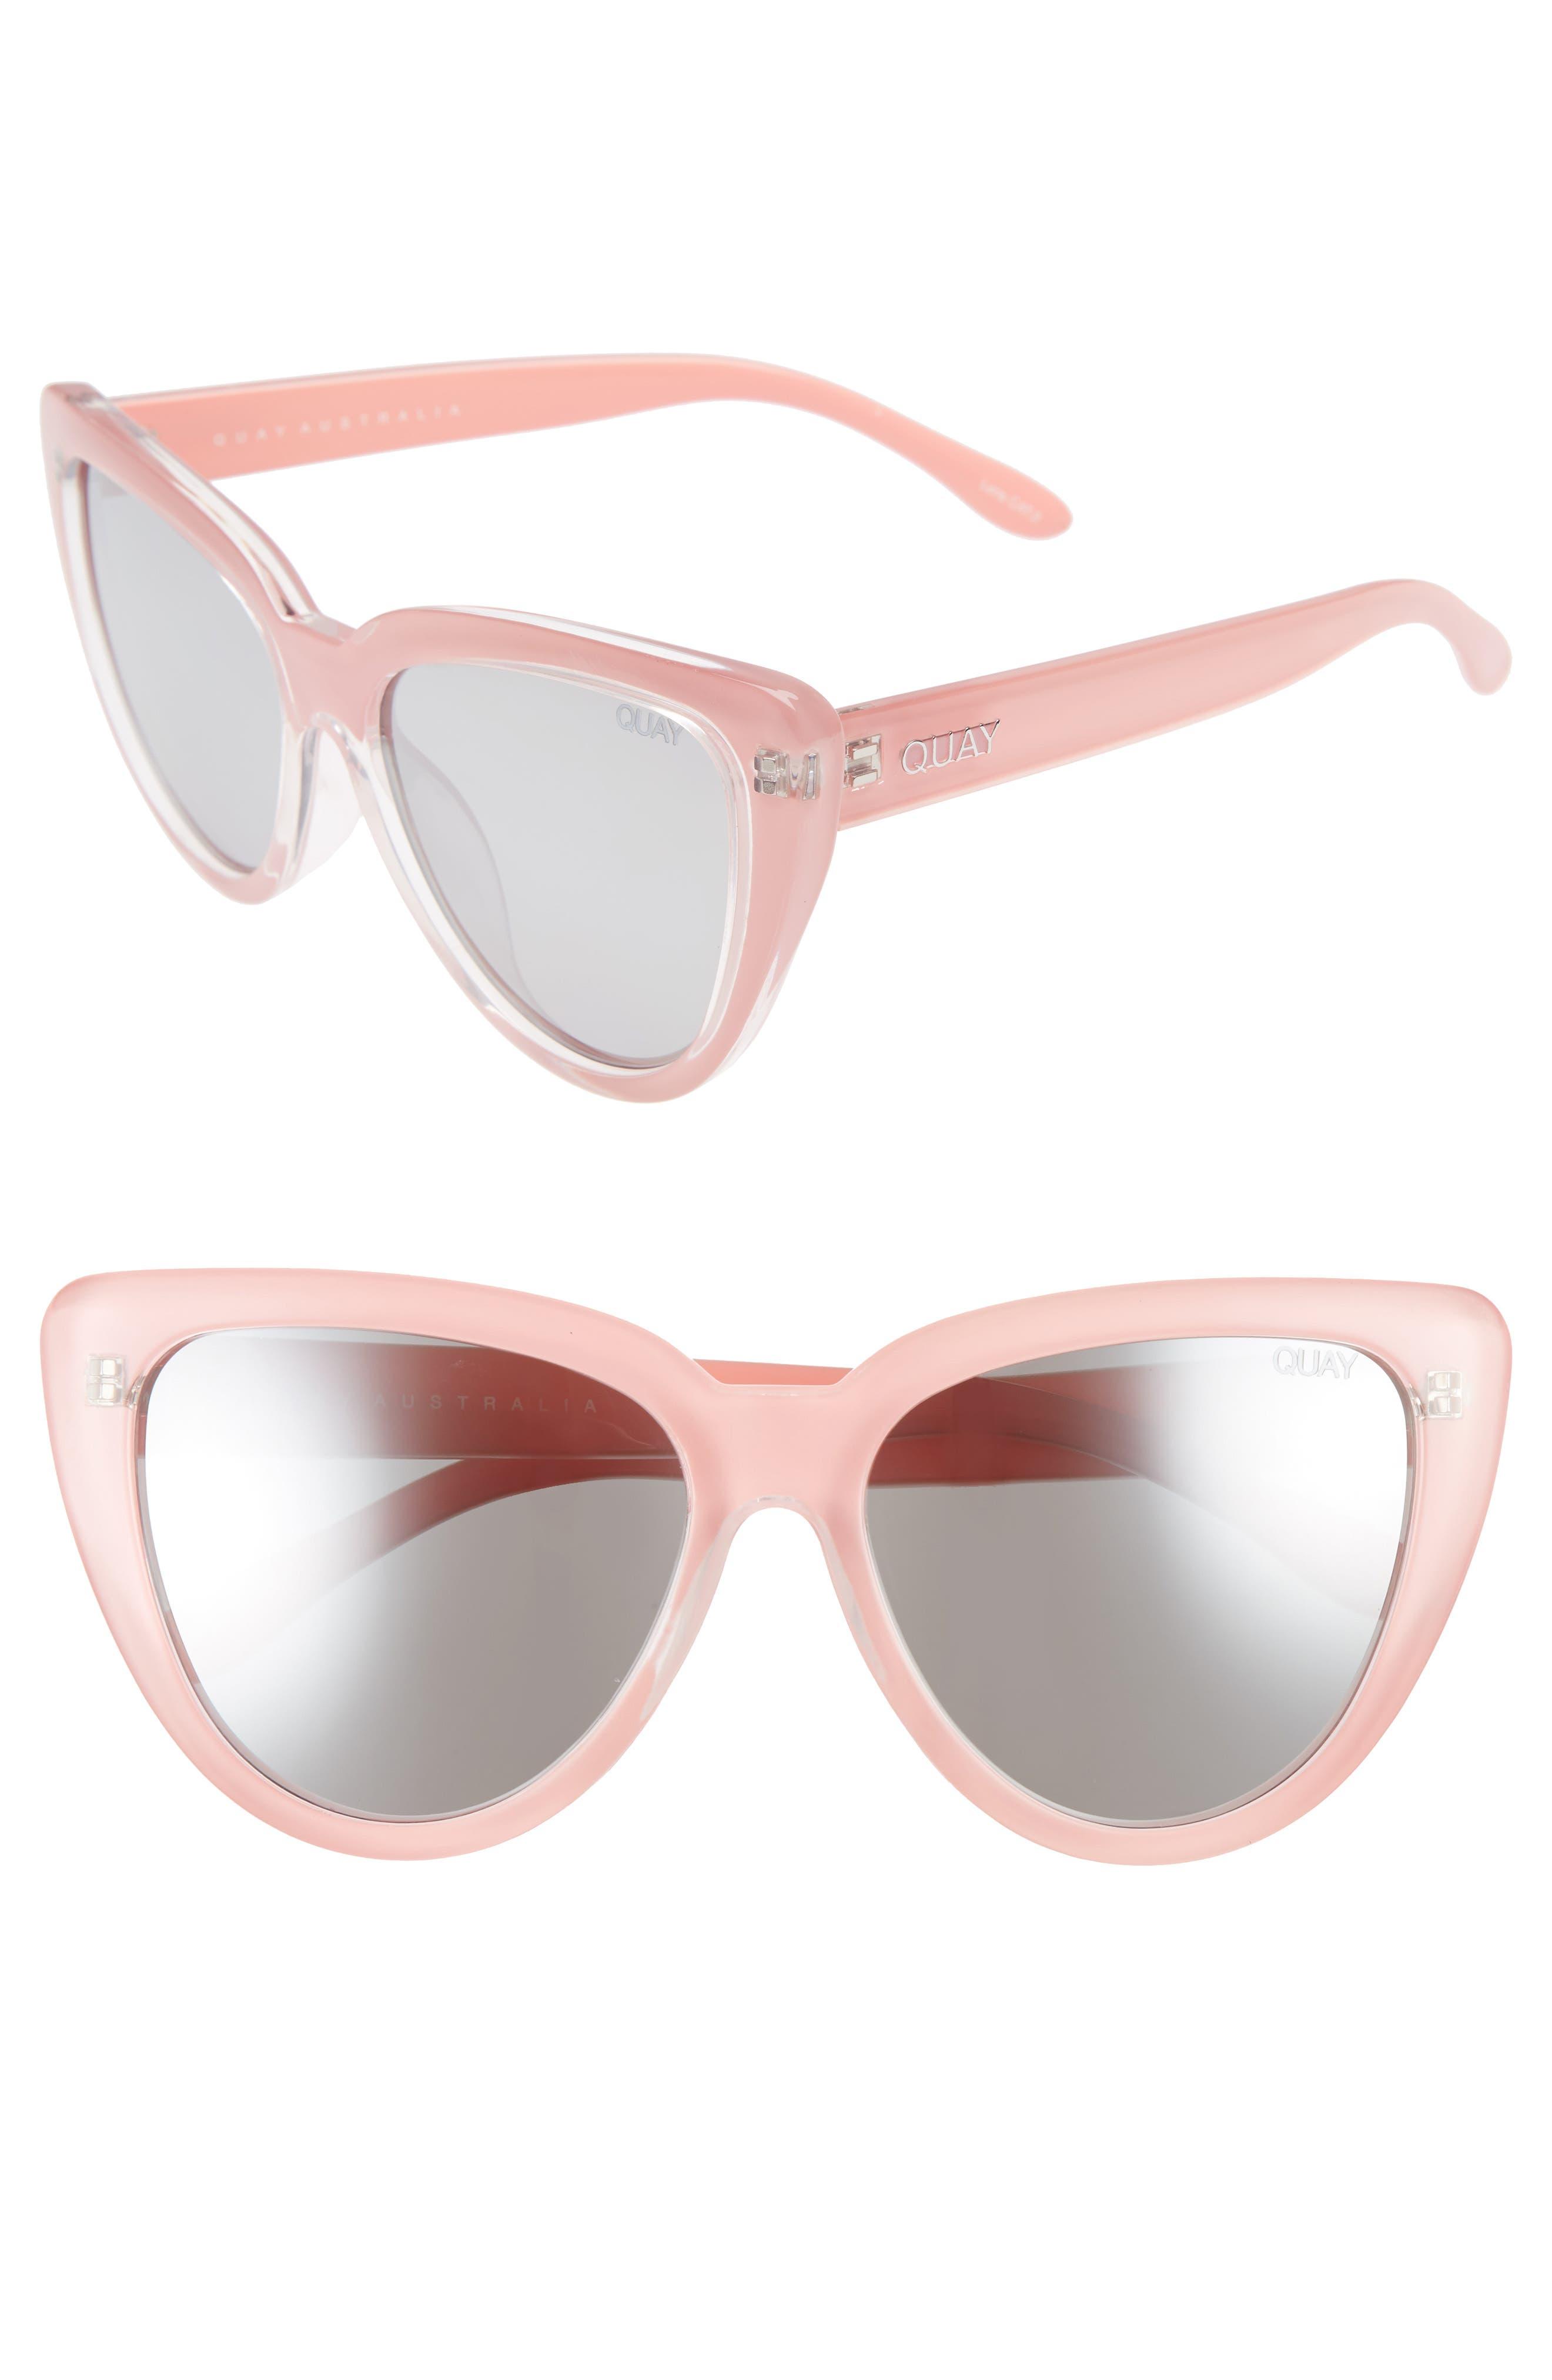 Quay Australia Stray Cat 58mm Mirrored Cat Eye Sunglasses